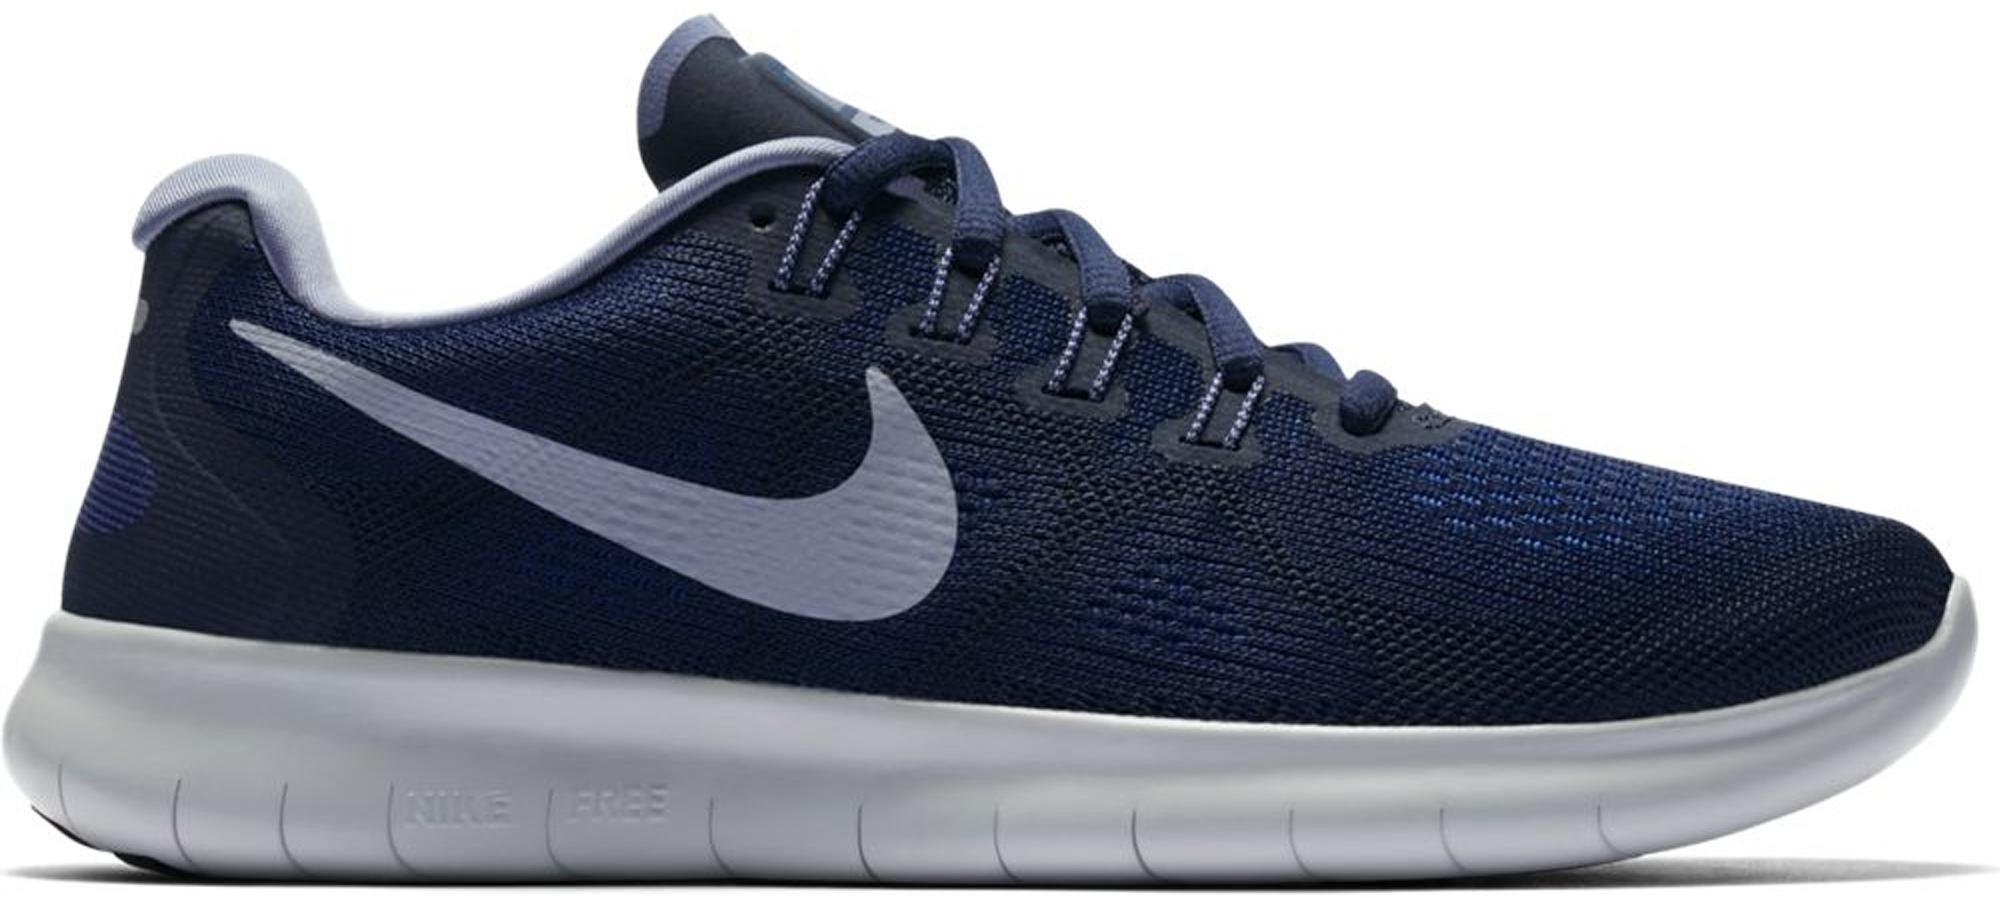 Nike Free RN 2017 Binary Blue (W